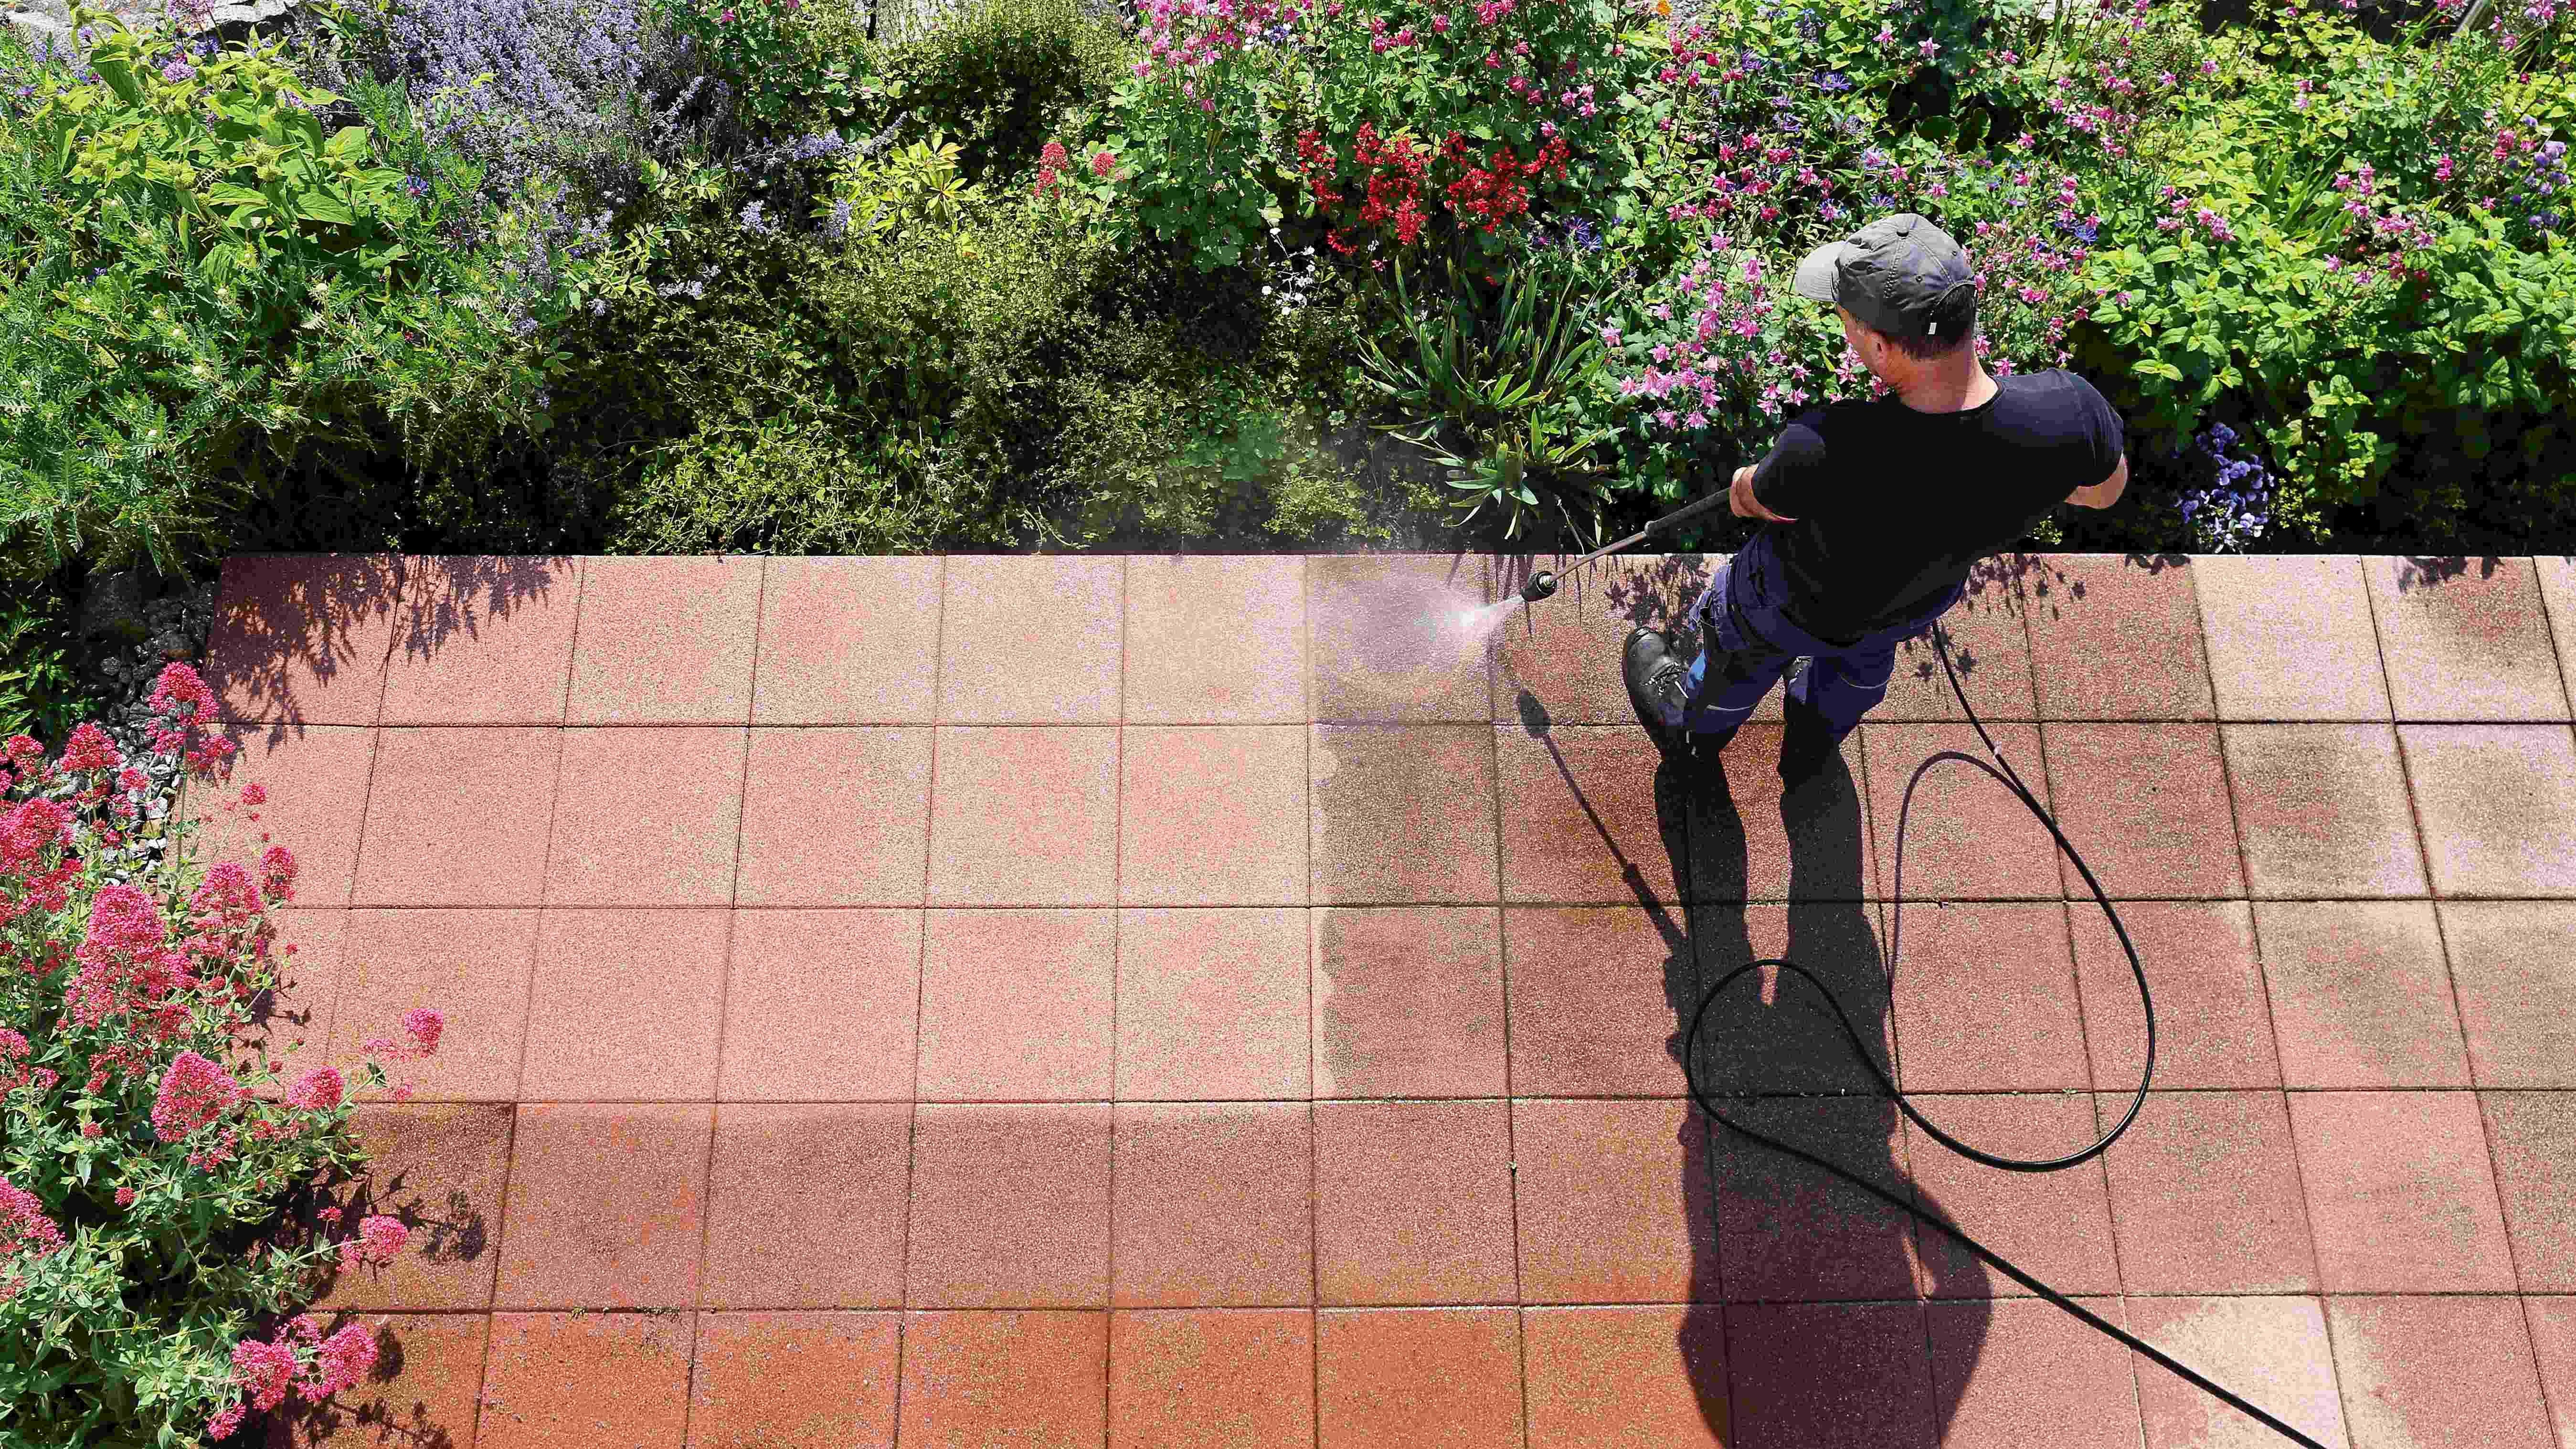 Nettoyer une terrasse avec un nettoyeur haute pression